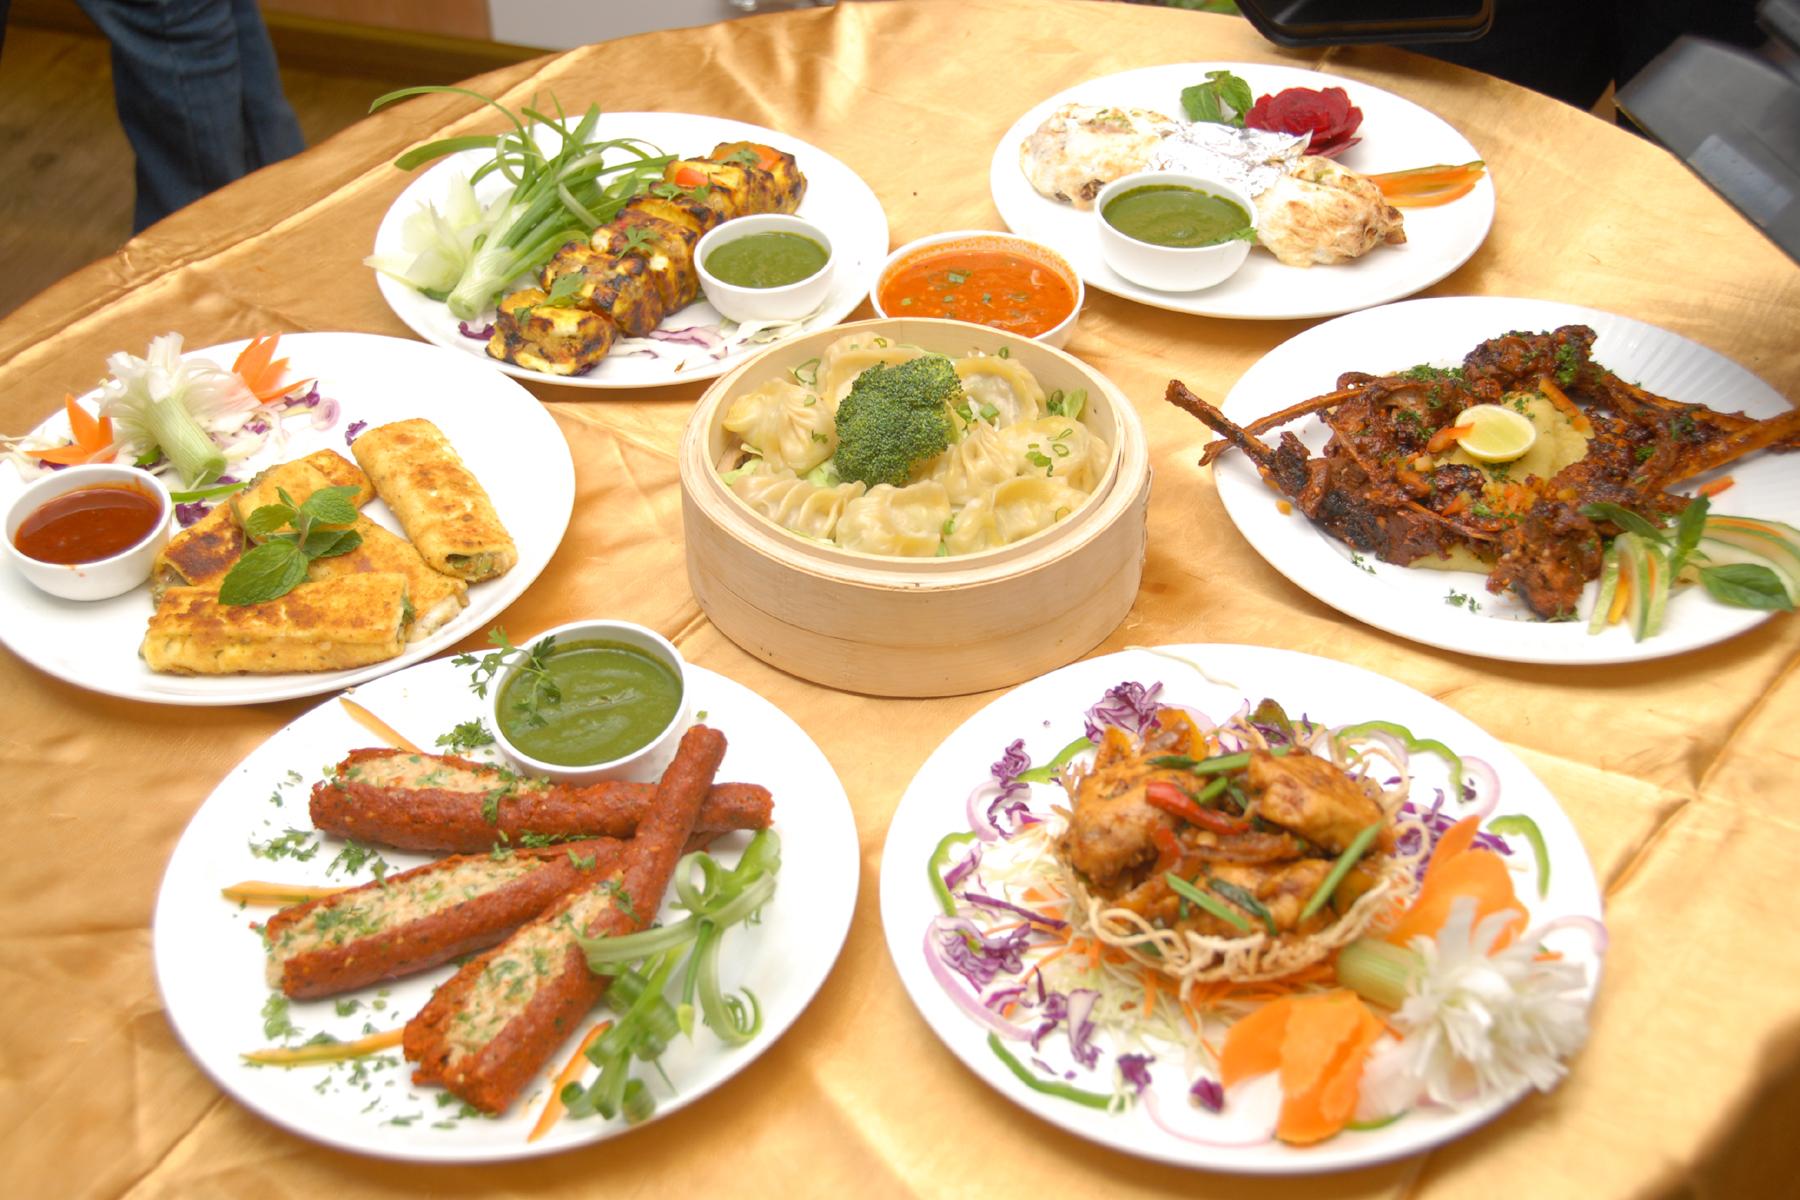 Select dishes at Crossroad Cae, Best Western Ashoka Hitec City